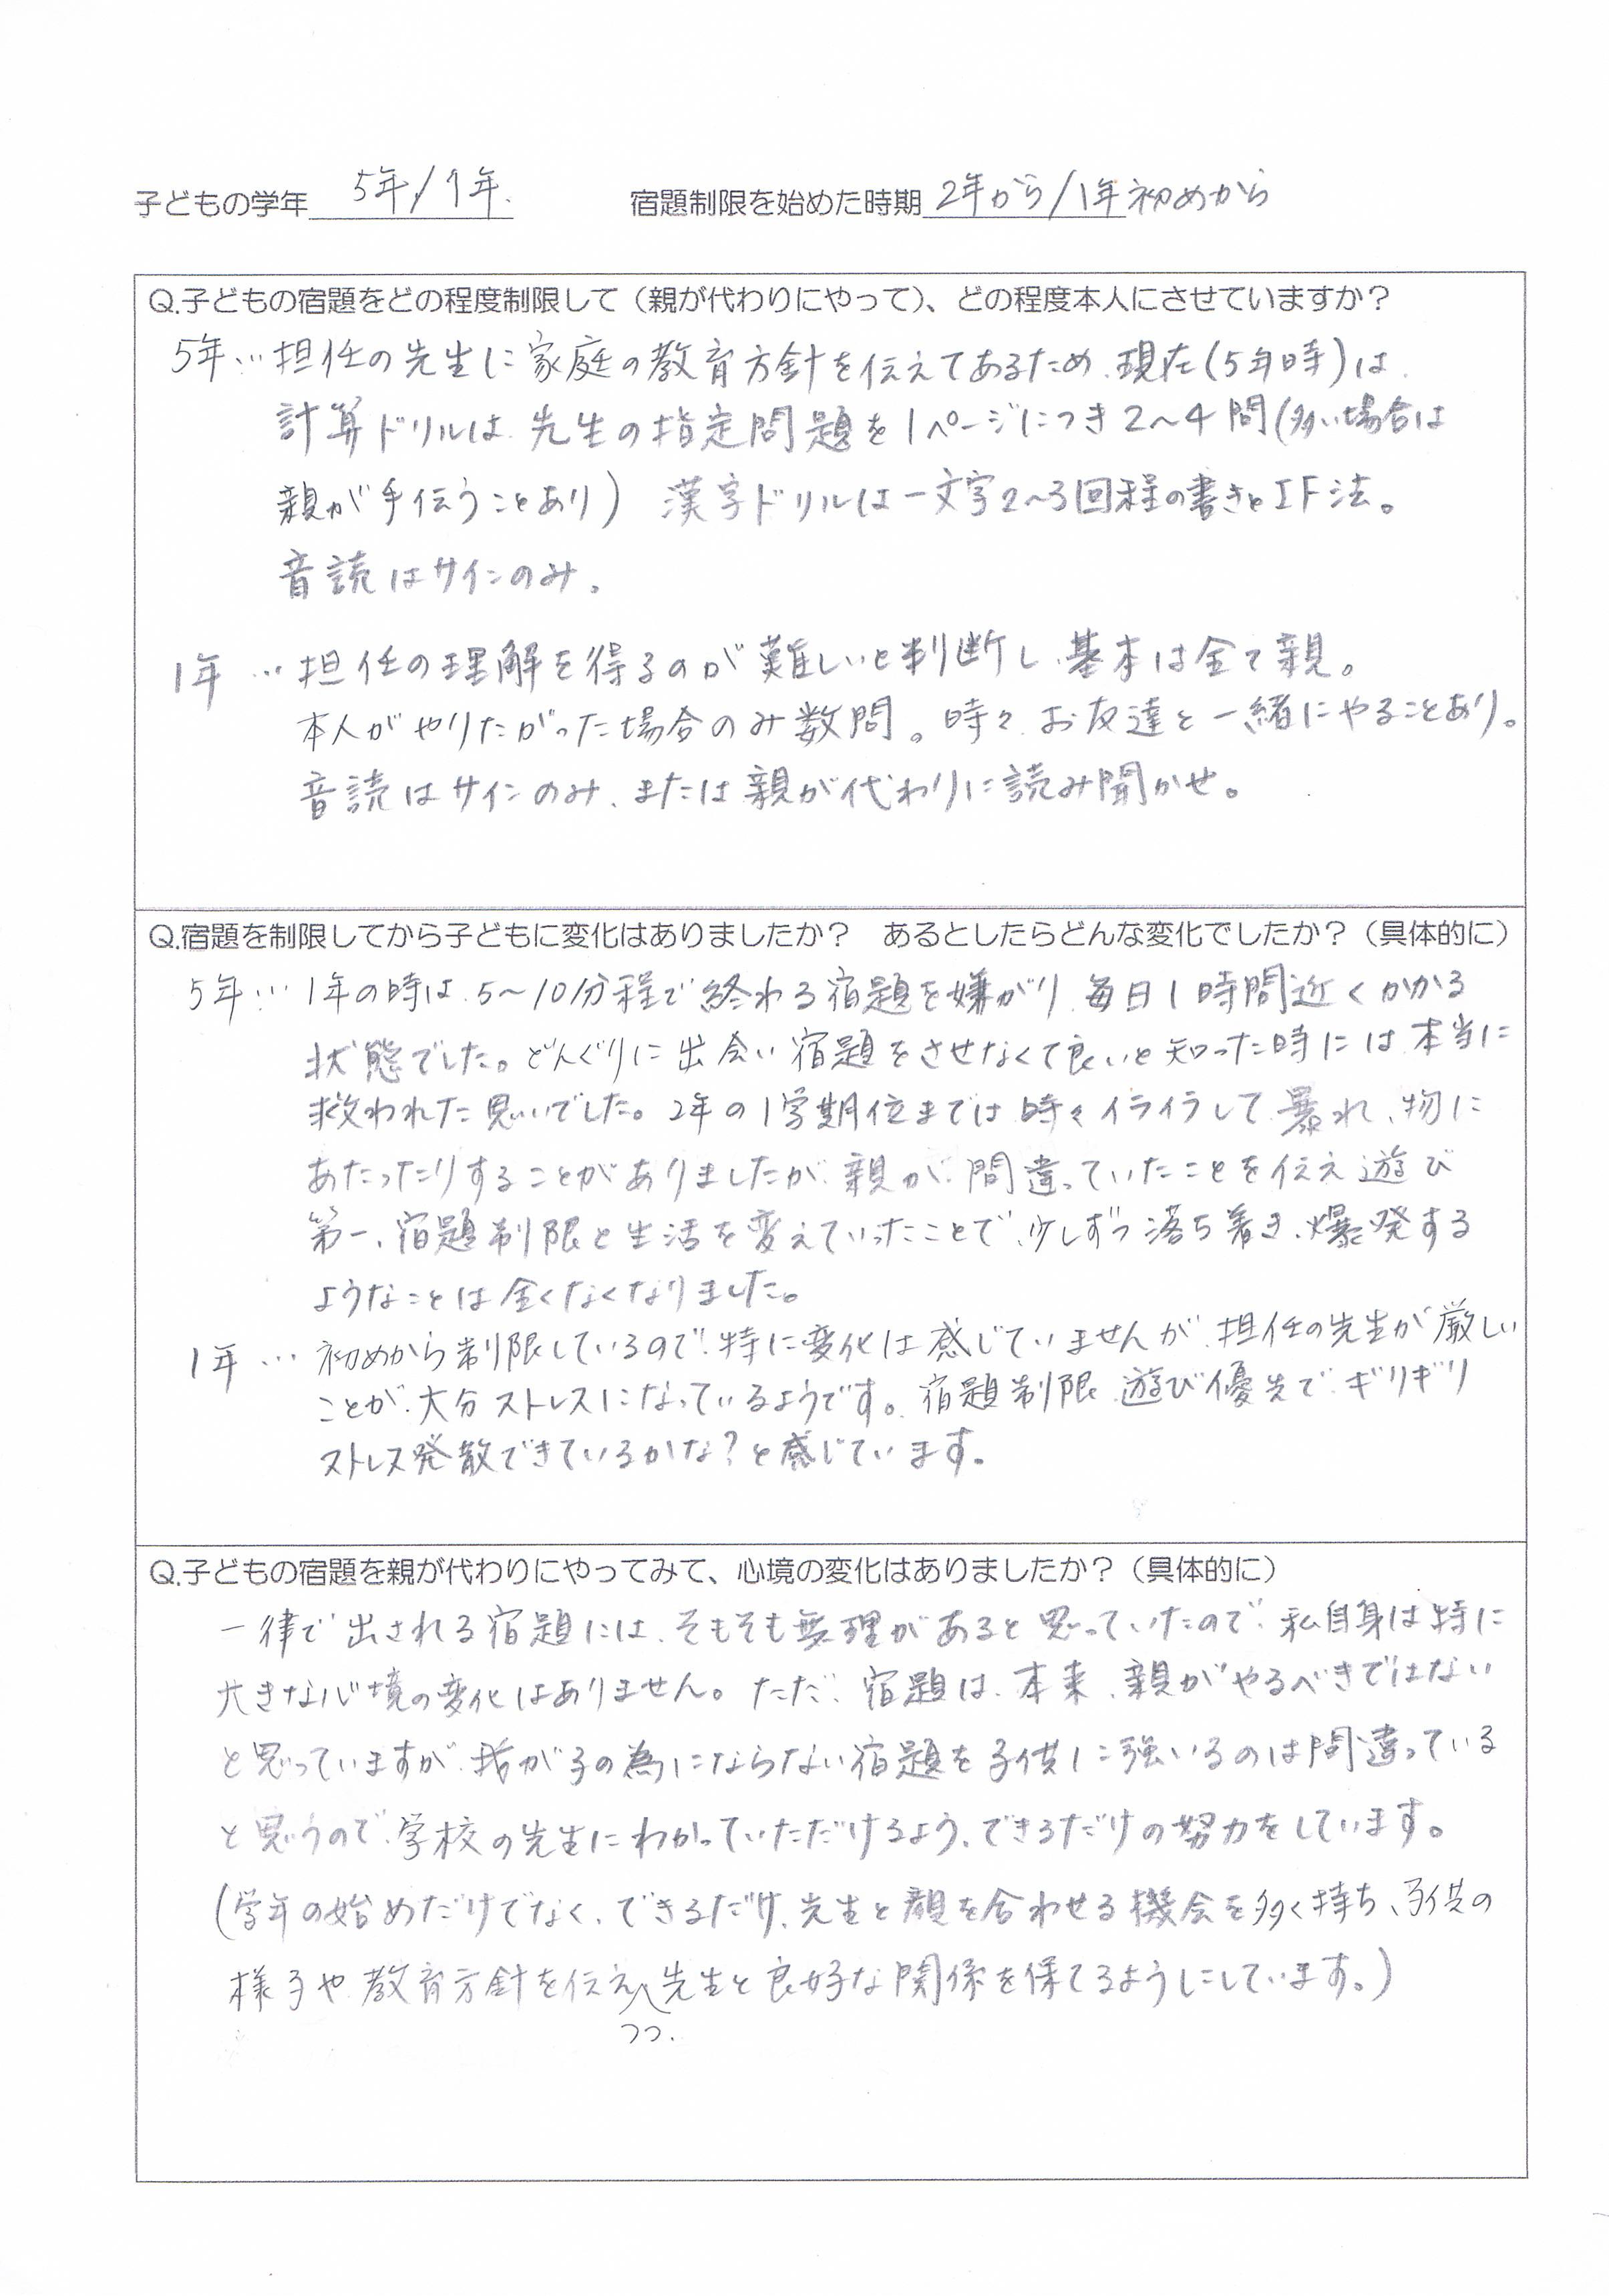 CCF20151031_00001.jpg